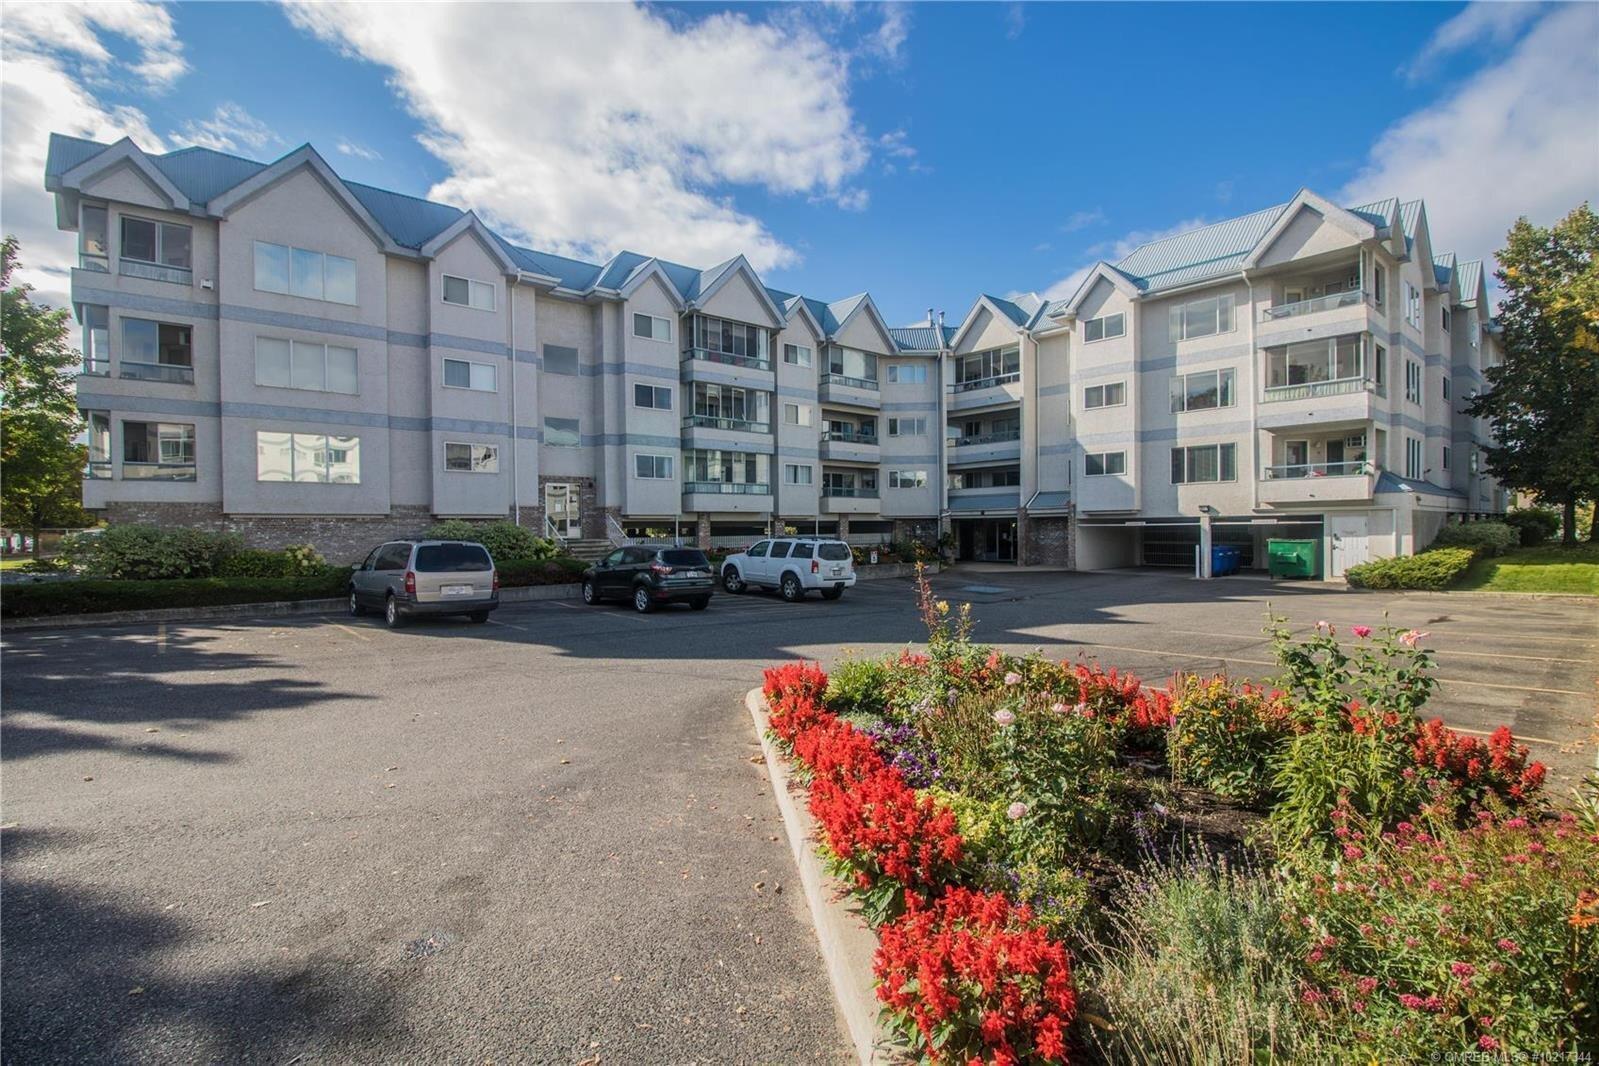 Condo for sale at 180 Hollywood Rd Unit 109 Kelowna British Columbia - MLS: 10217344